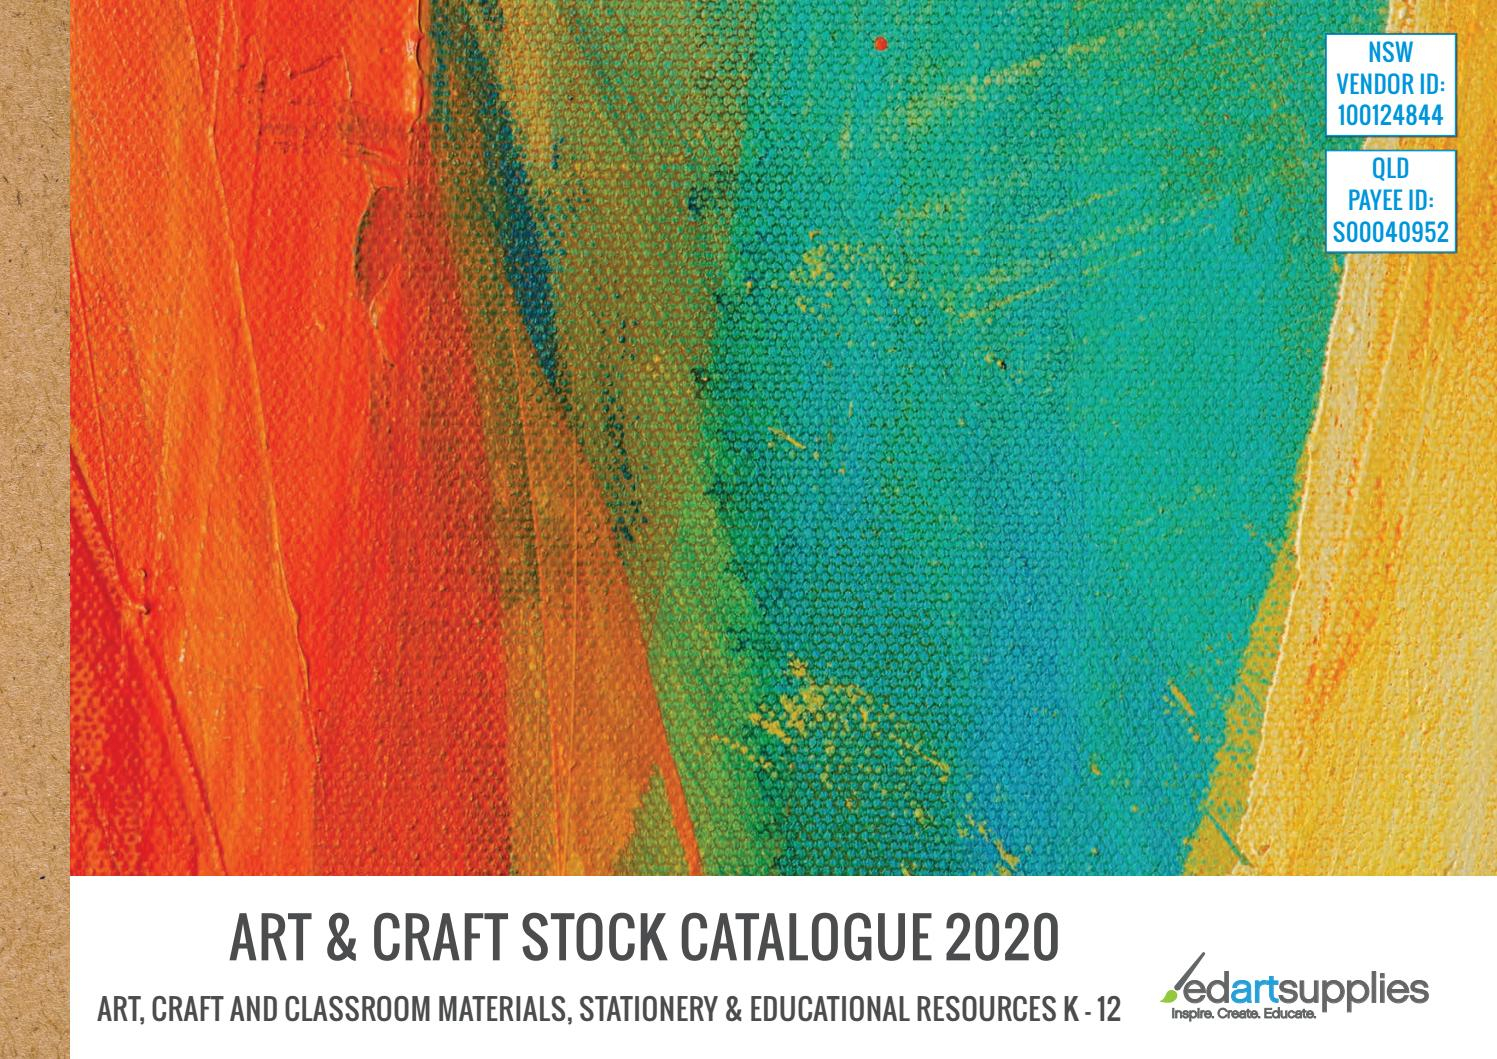 2020 Art & Craft Stock Catalogueedartsupplies – Issuu Regarding Best And Newest Blended Fabric Mod Dinosaur 3 Piece Wall Hangings Set (View 17 of 20)